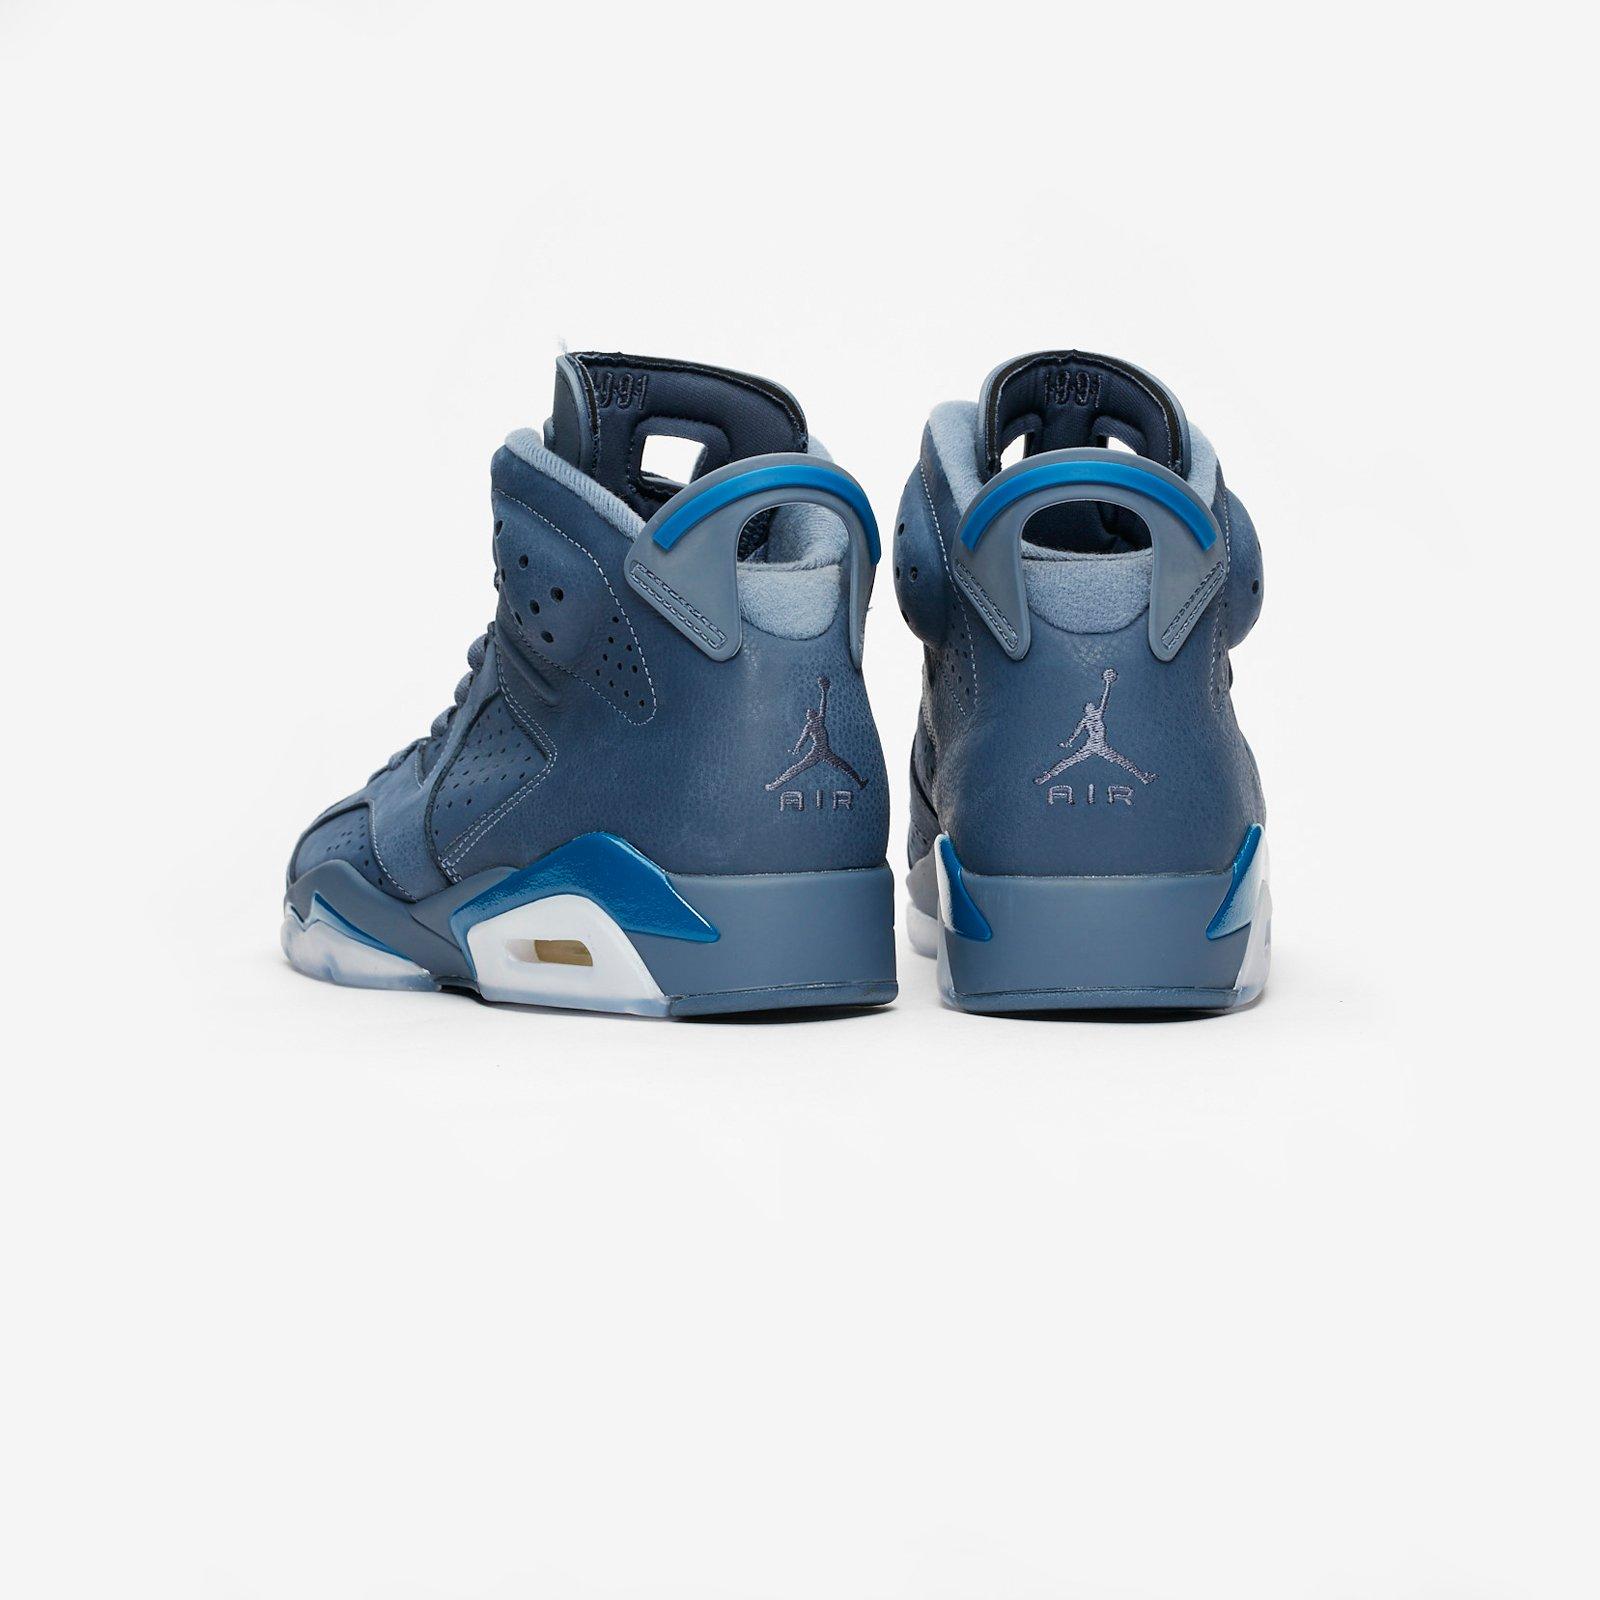 605a7f04ad8 Jordan Brand Air Jordan 6 Retro - 384664-400 - Sneakersnstuff | sneakers &  streetwear online since 1999